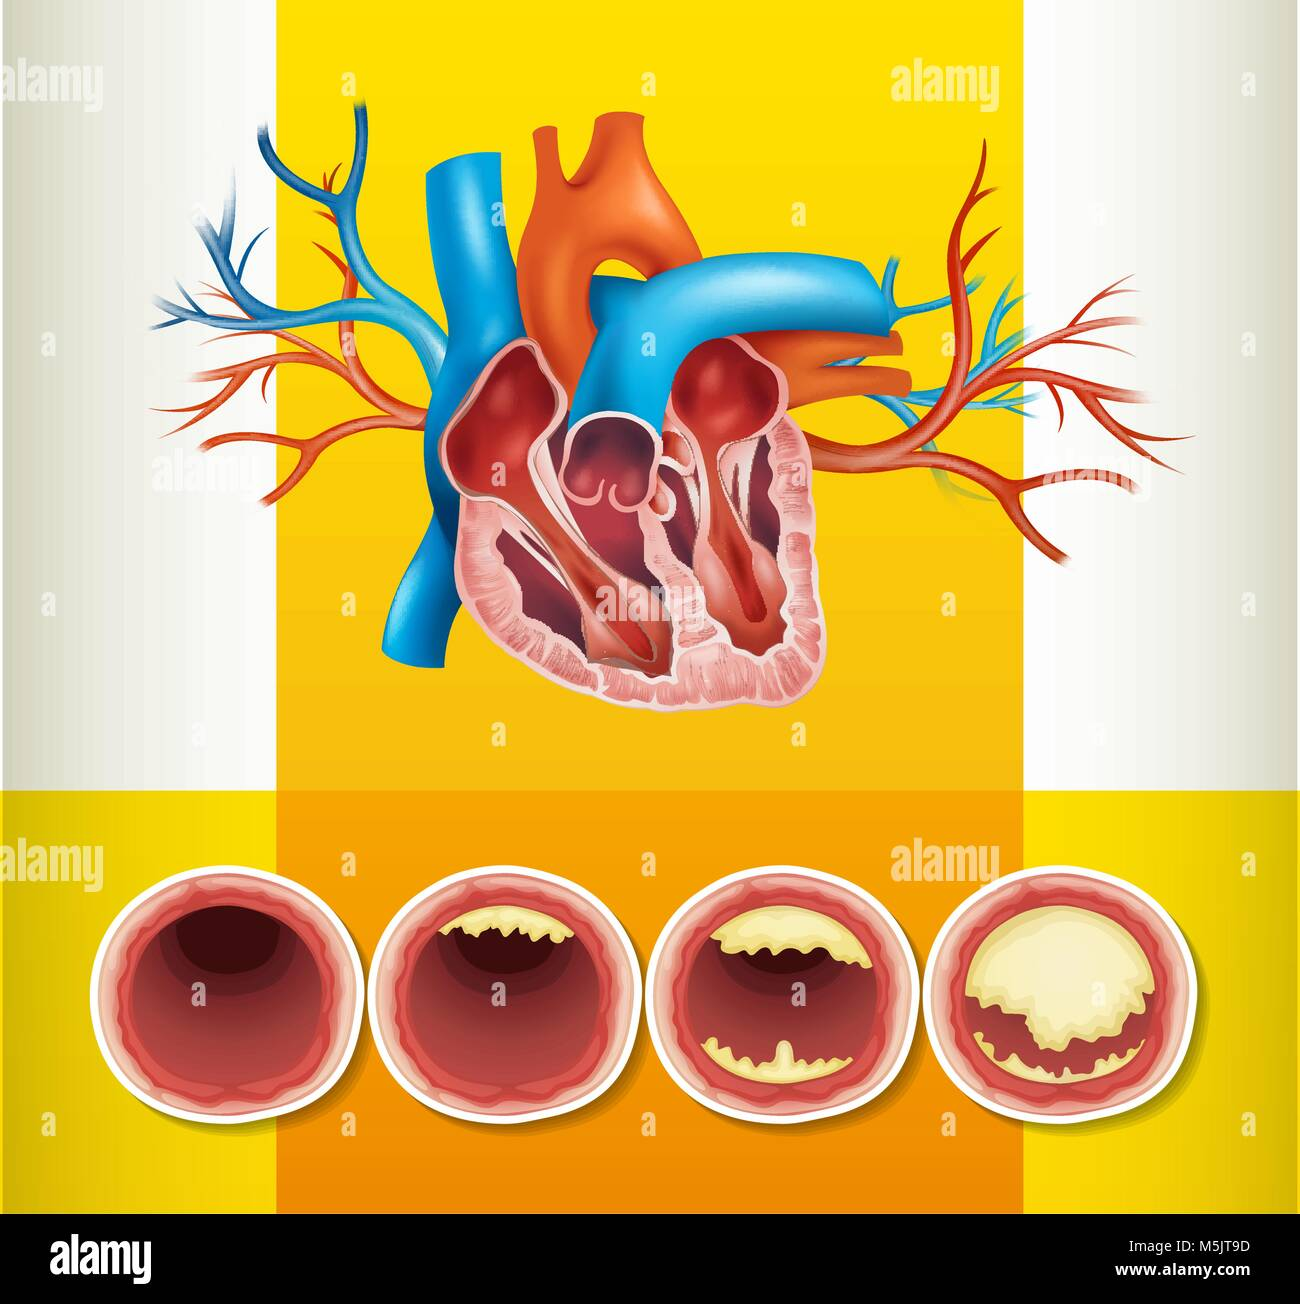 Heart anatomy and fat in vein illustration Stock Vector Art ...